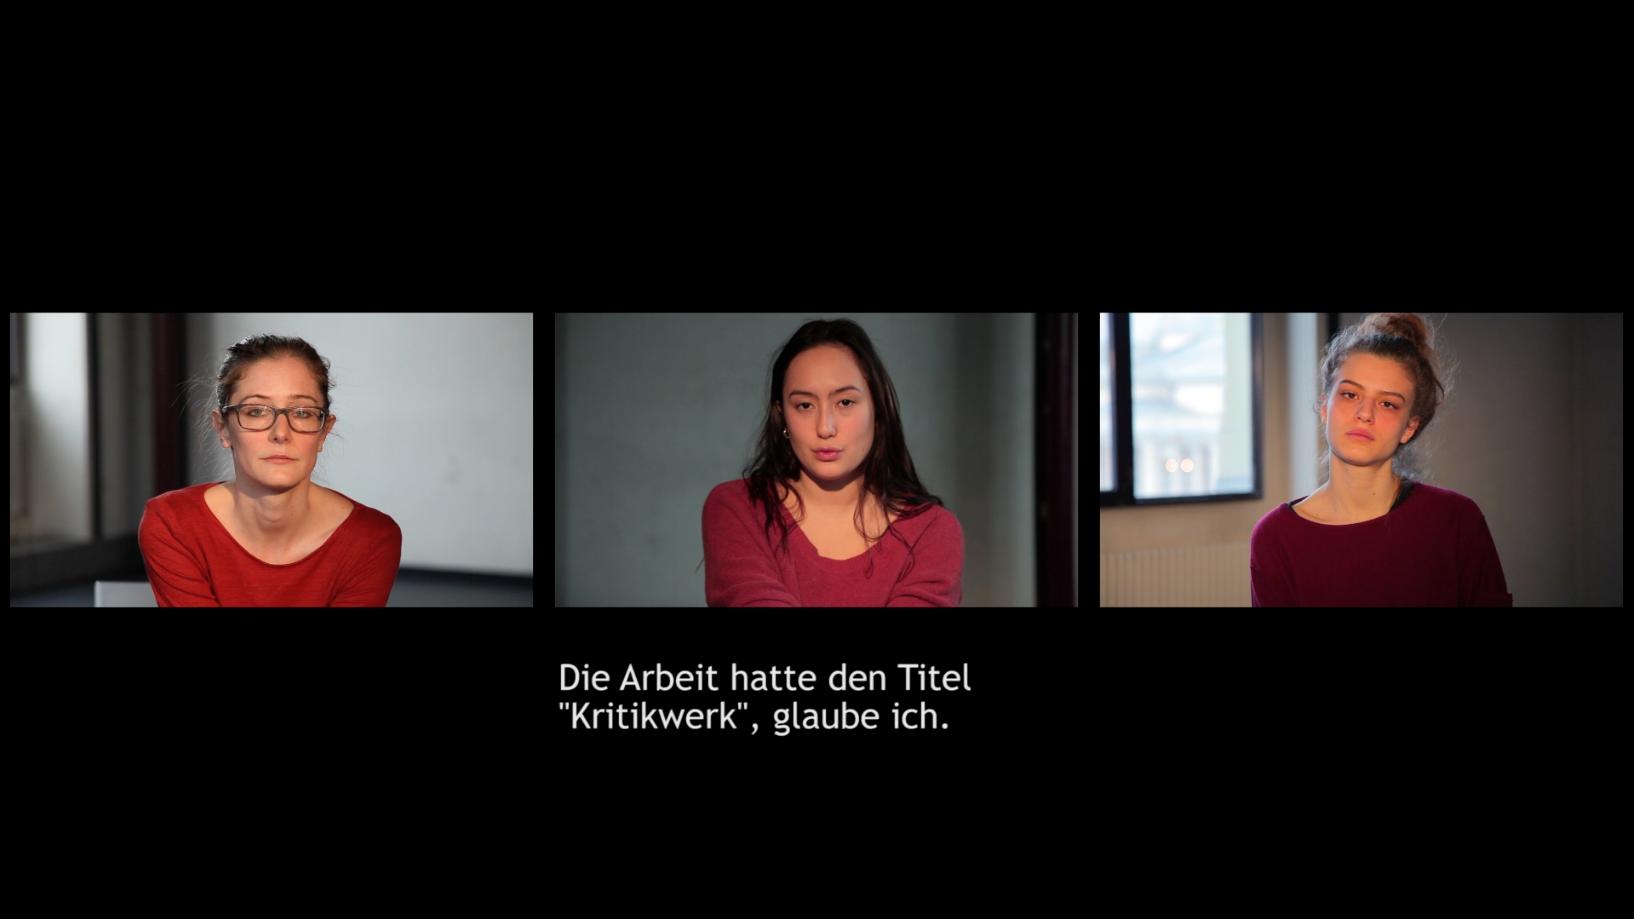 Video installation, 13min. In collaboration with  Anna Königshofer . In French, English/German subtitles. Performer: Éléonore Chalié, Marie Cornil, Anne-Lisa Tacheron.